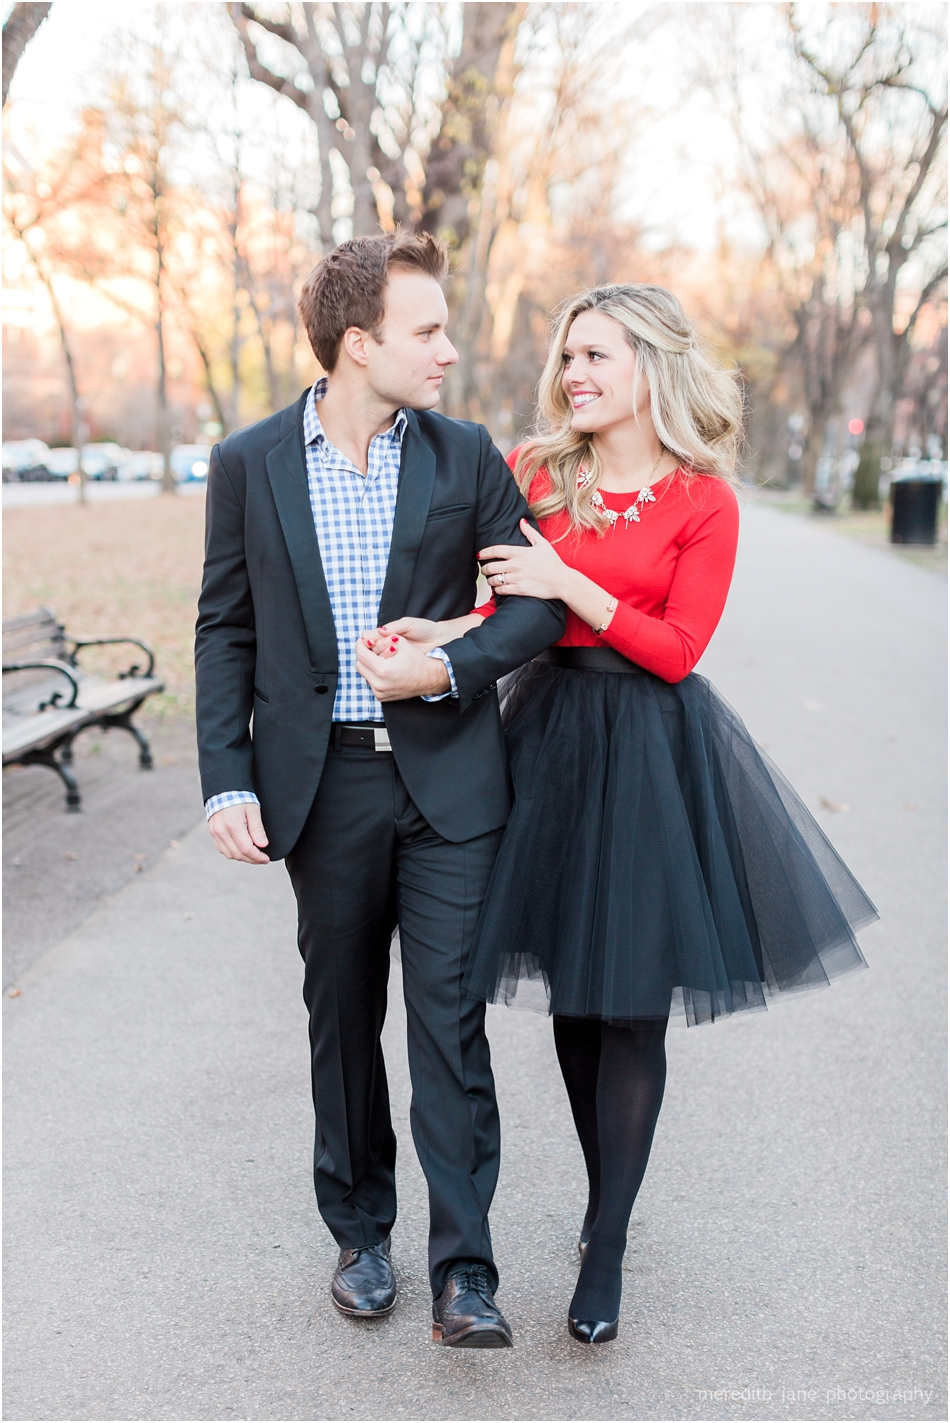 holiday_boston_massachusetts_engagement_commonwealth_ave_fall_foliage_cape_cod_wedding_photographer_Meredith_Jane_Photography_photo_0993.jpg